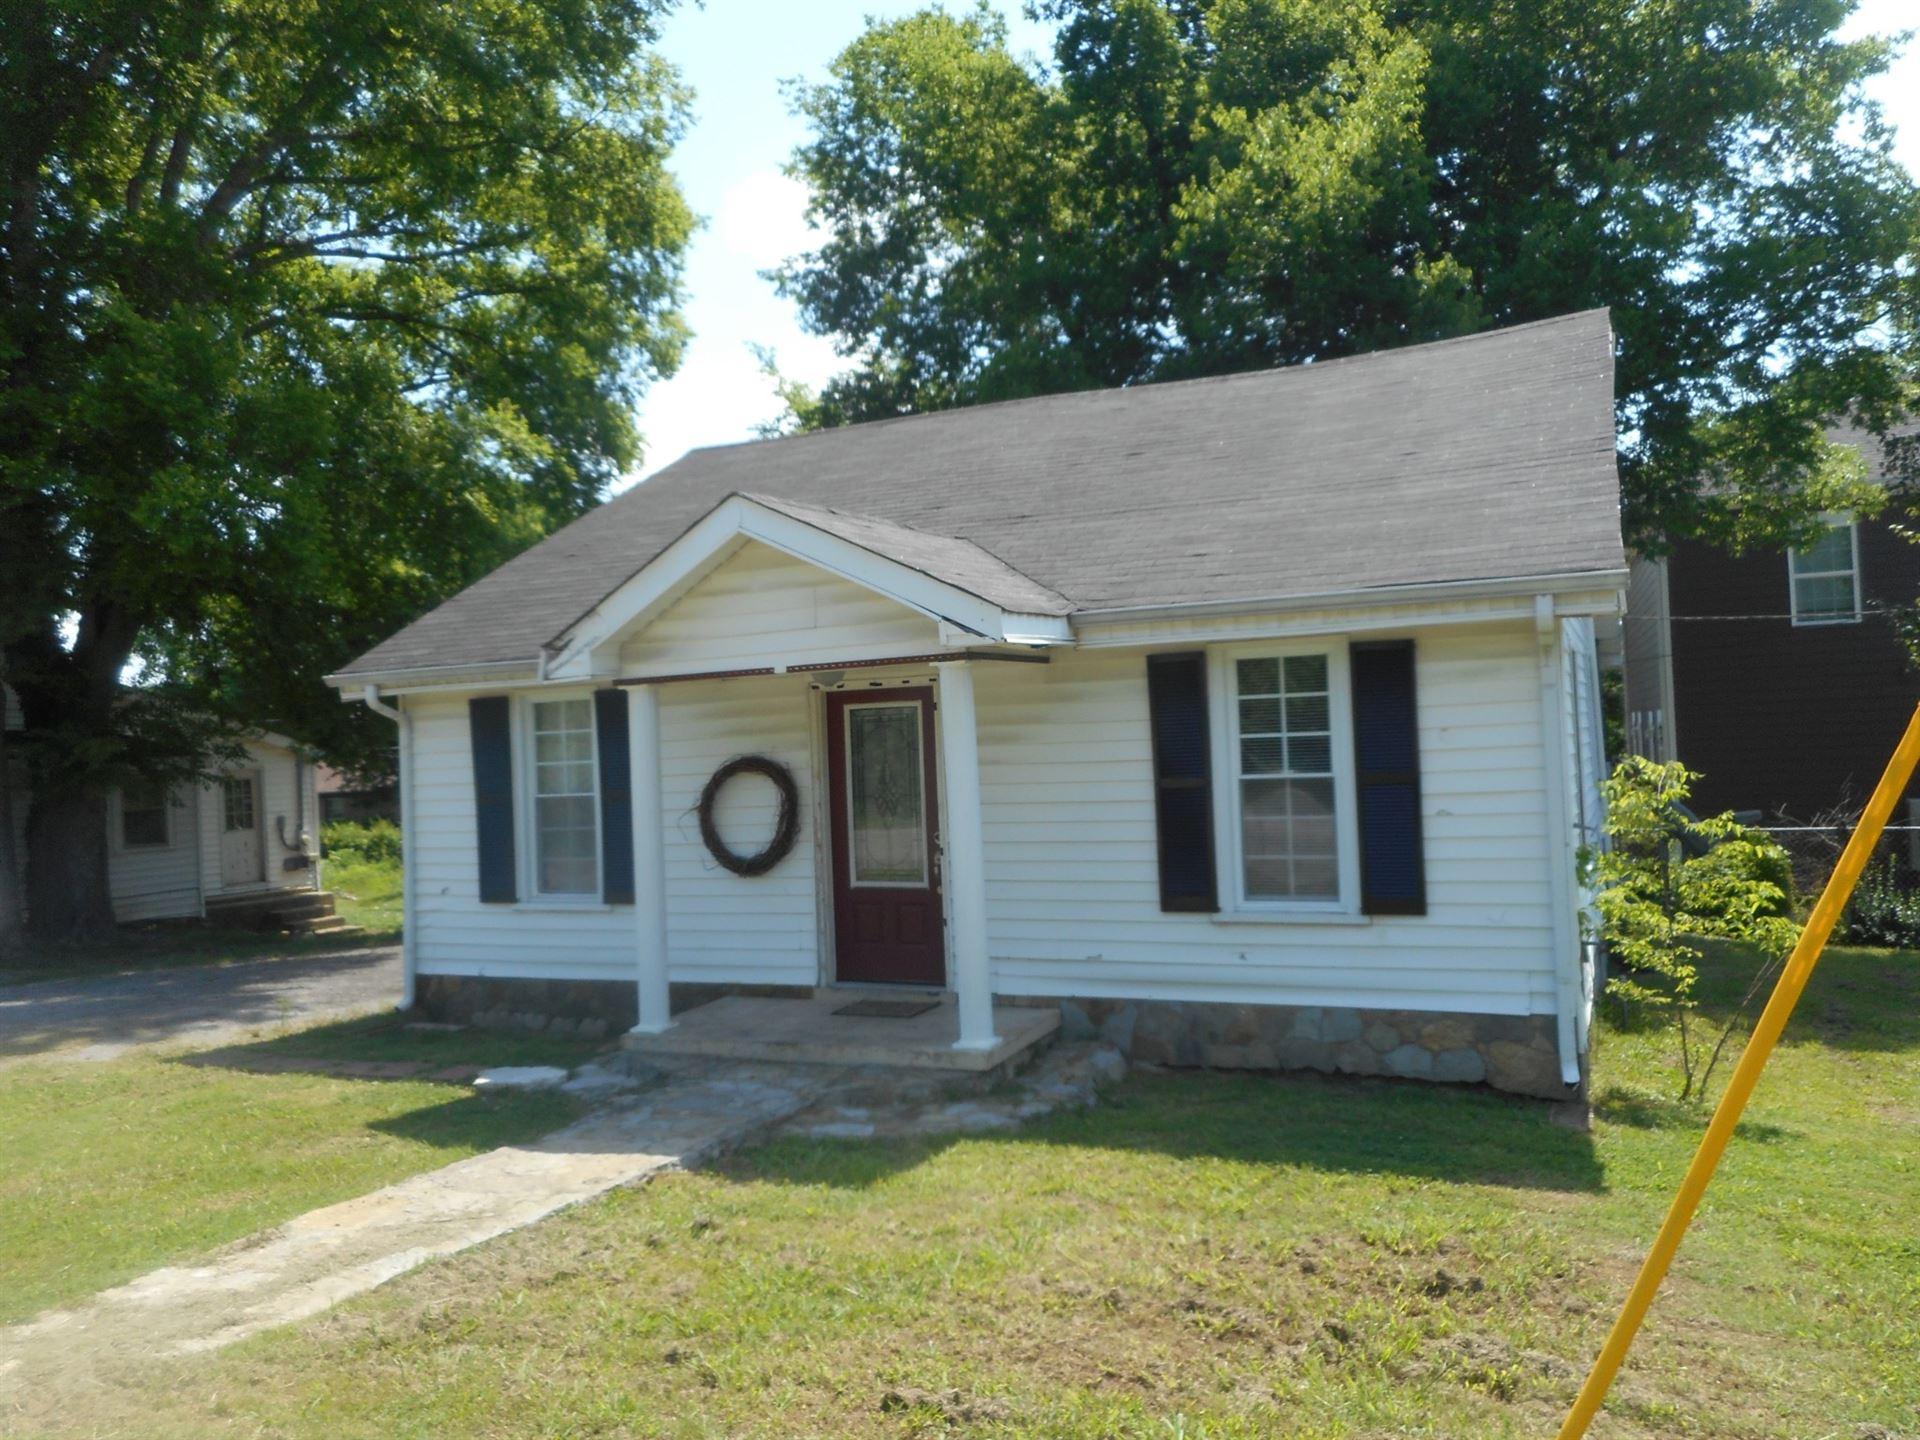 113 L and N Ave, Lewisburg, TN 37091 - MLS#: 2264220